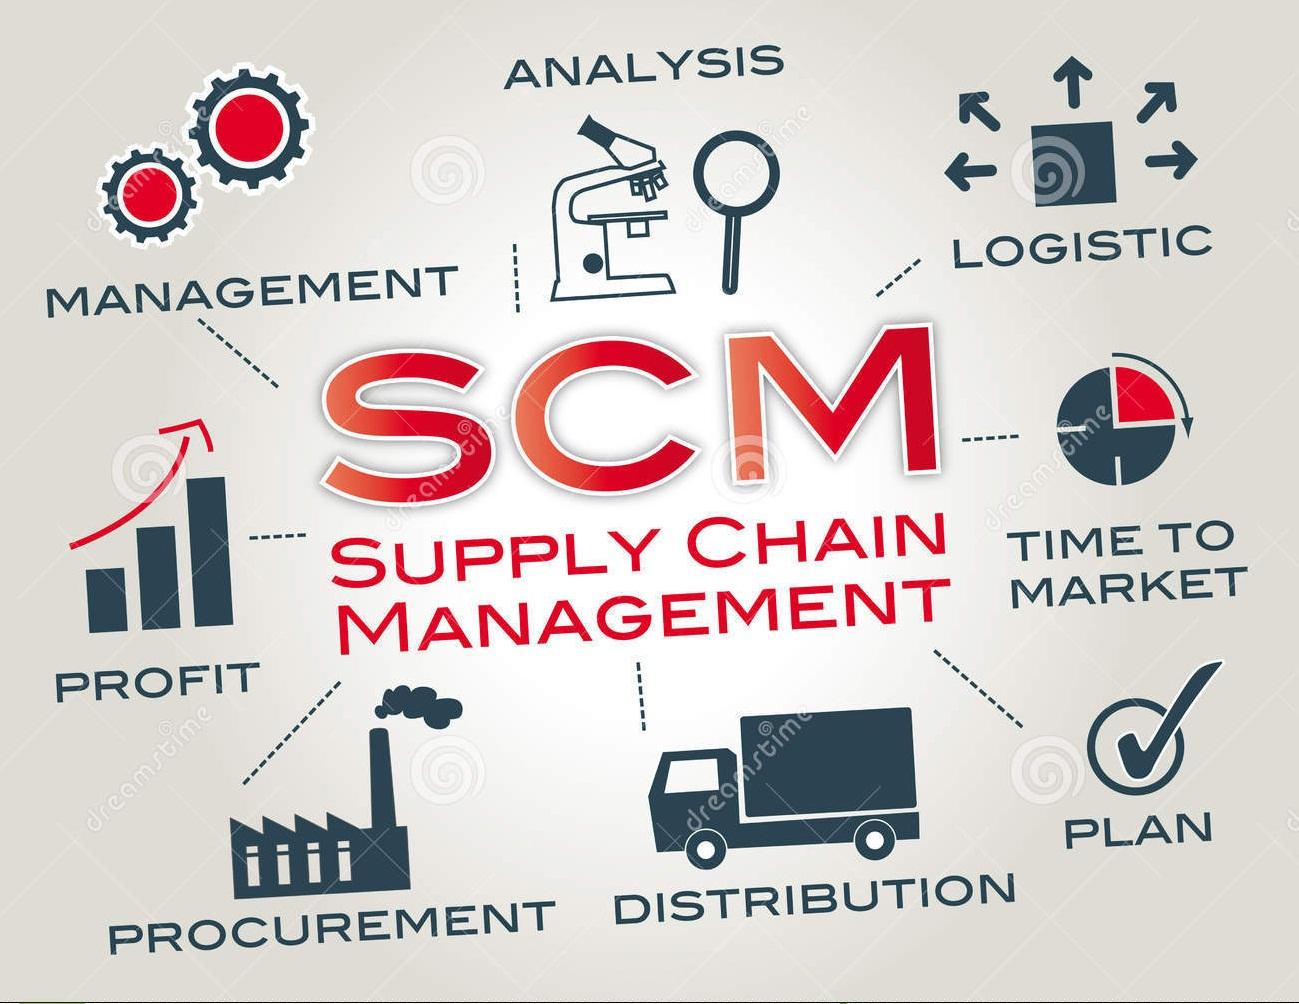 Supply Chain Management in 2017